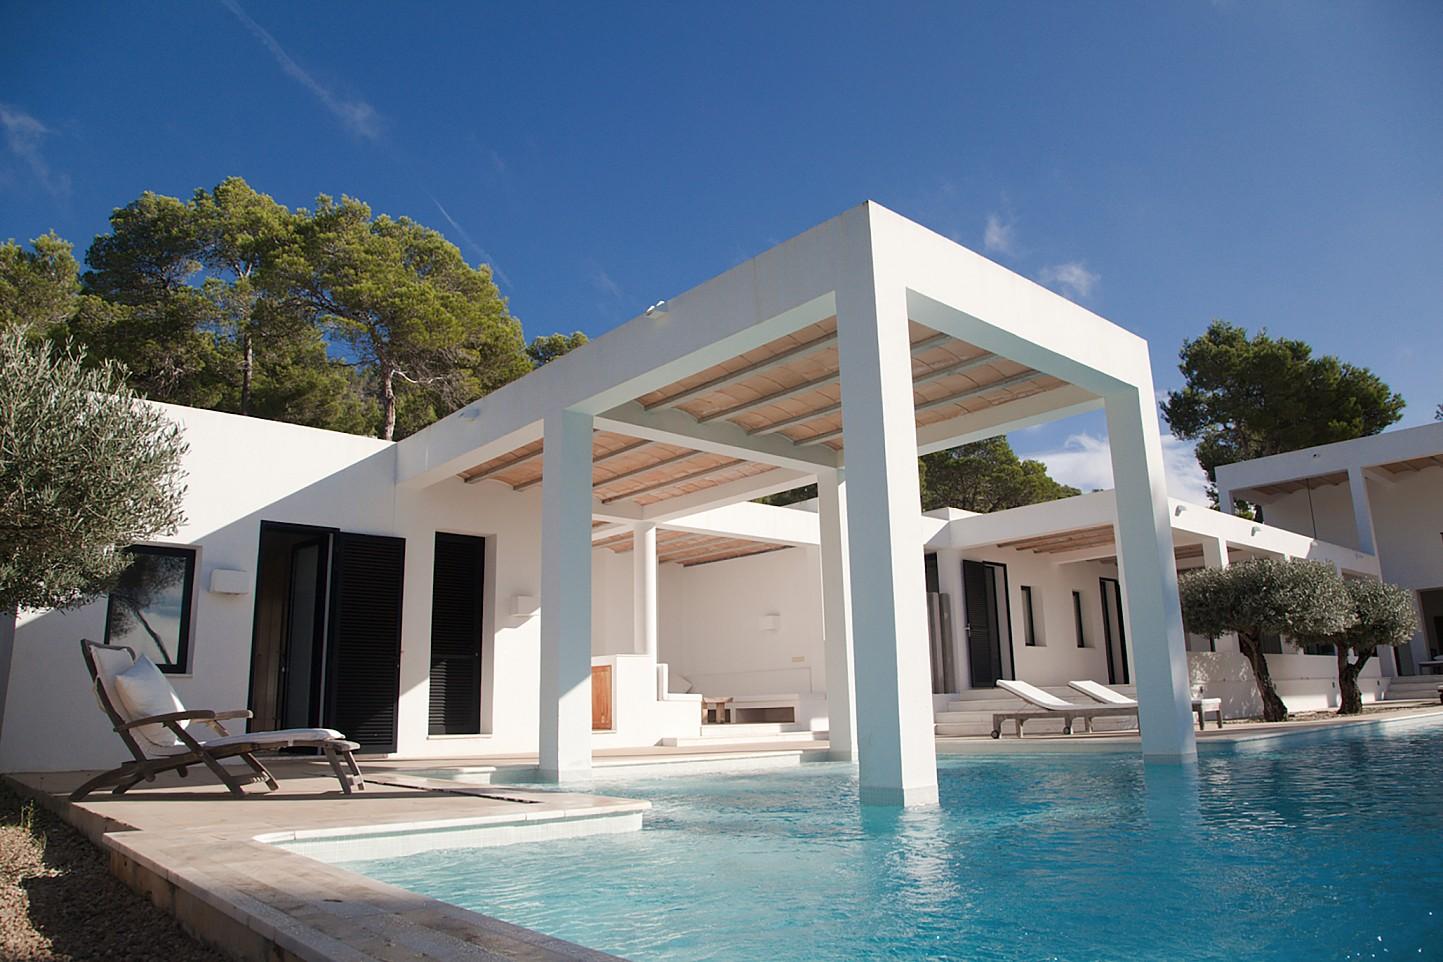 Minimalista casa en alquiler cerca de san carlos ibiza oi realtor - Apartamentos ibiza alquiler ...